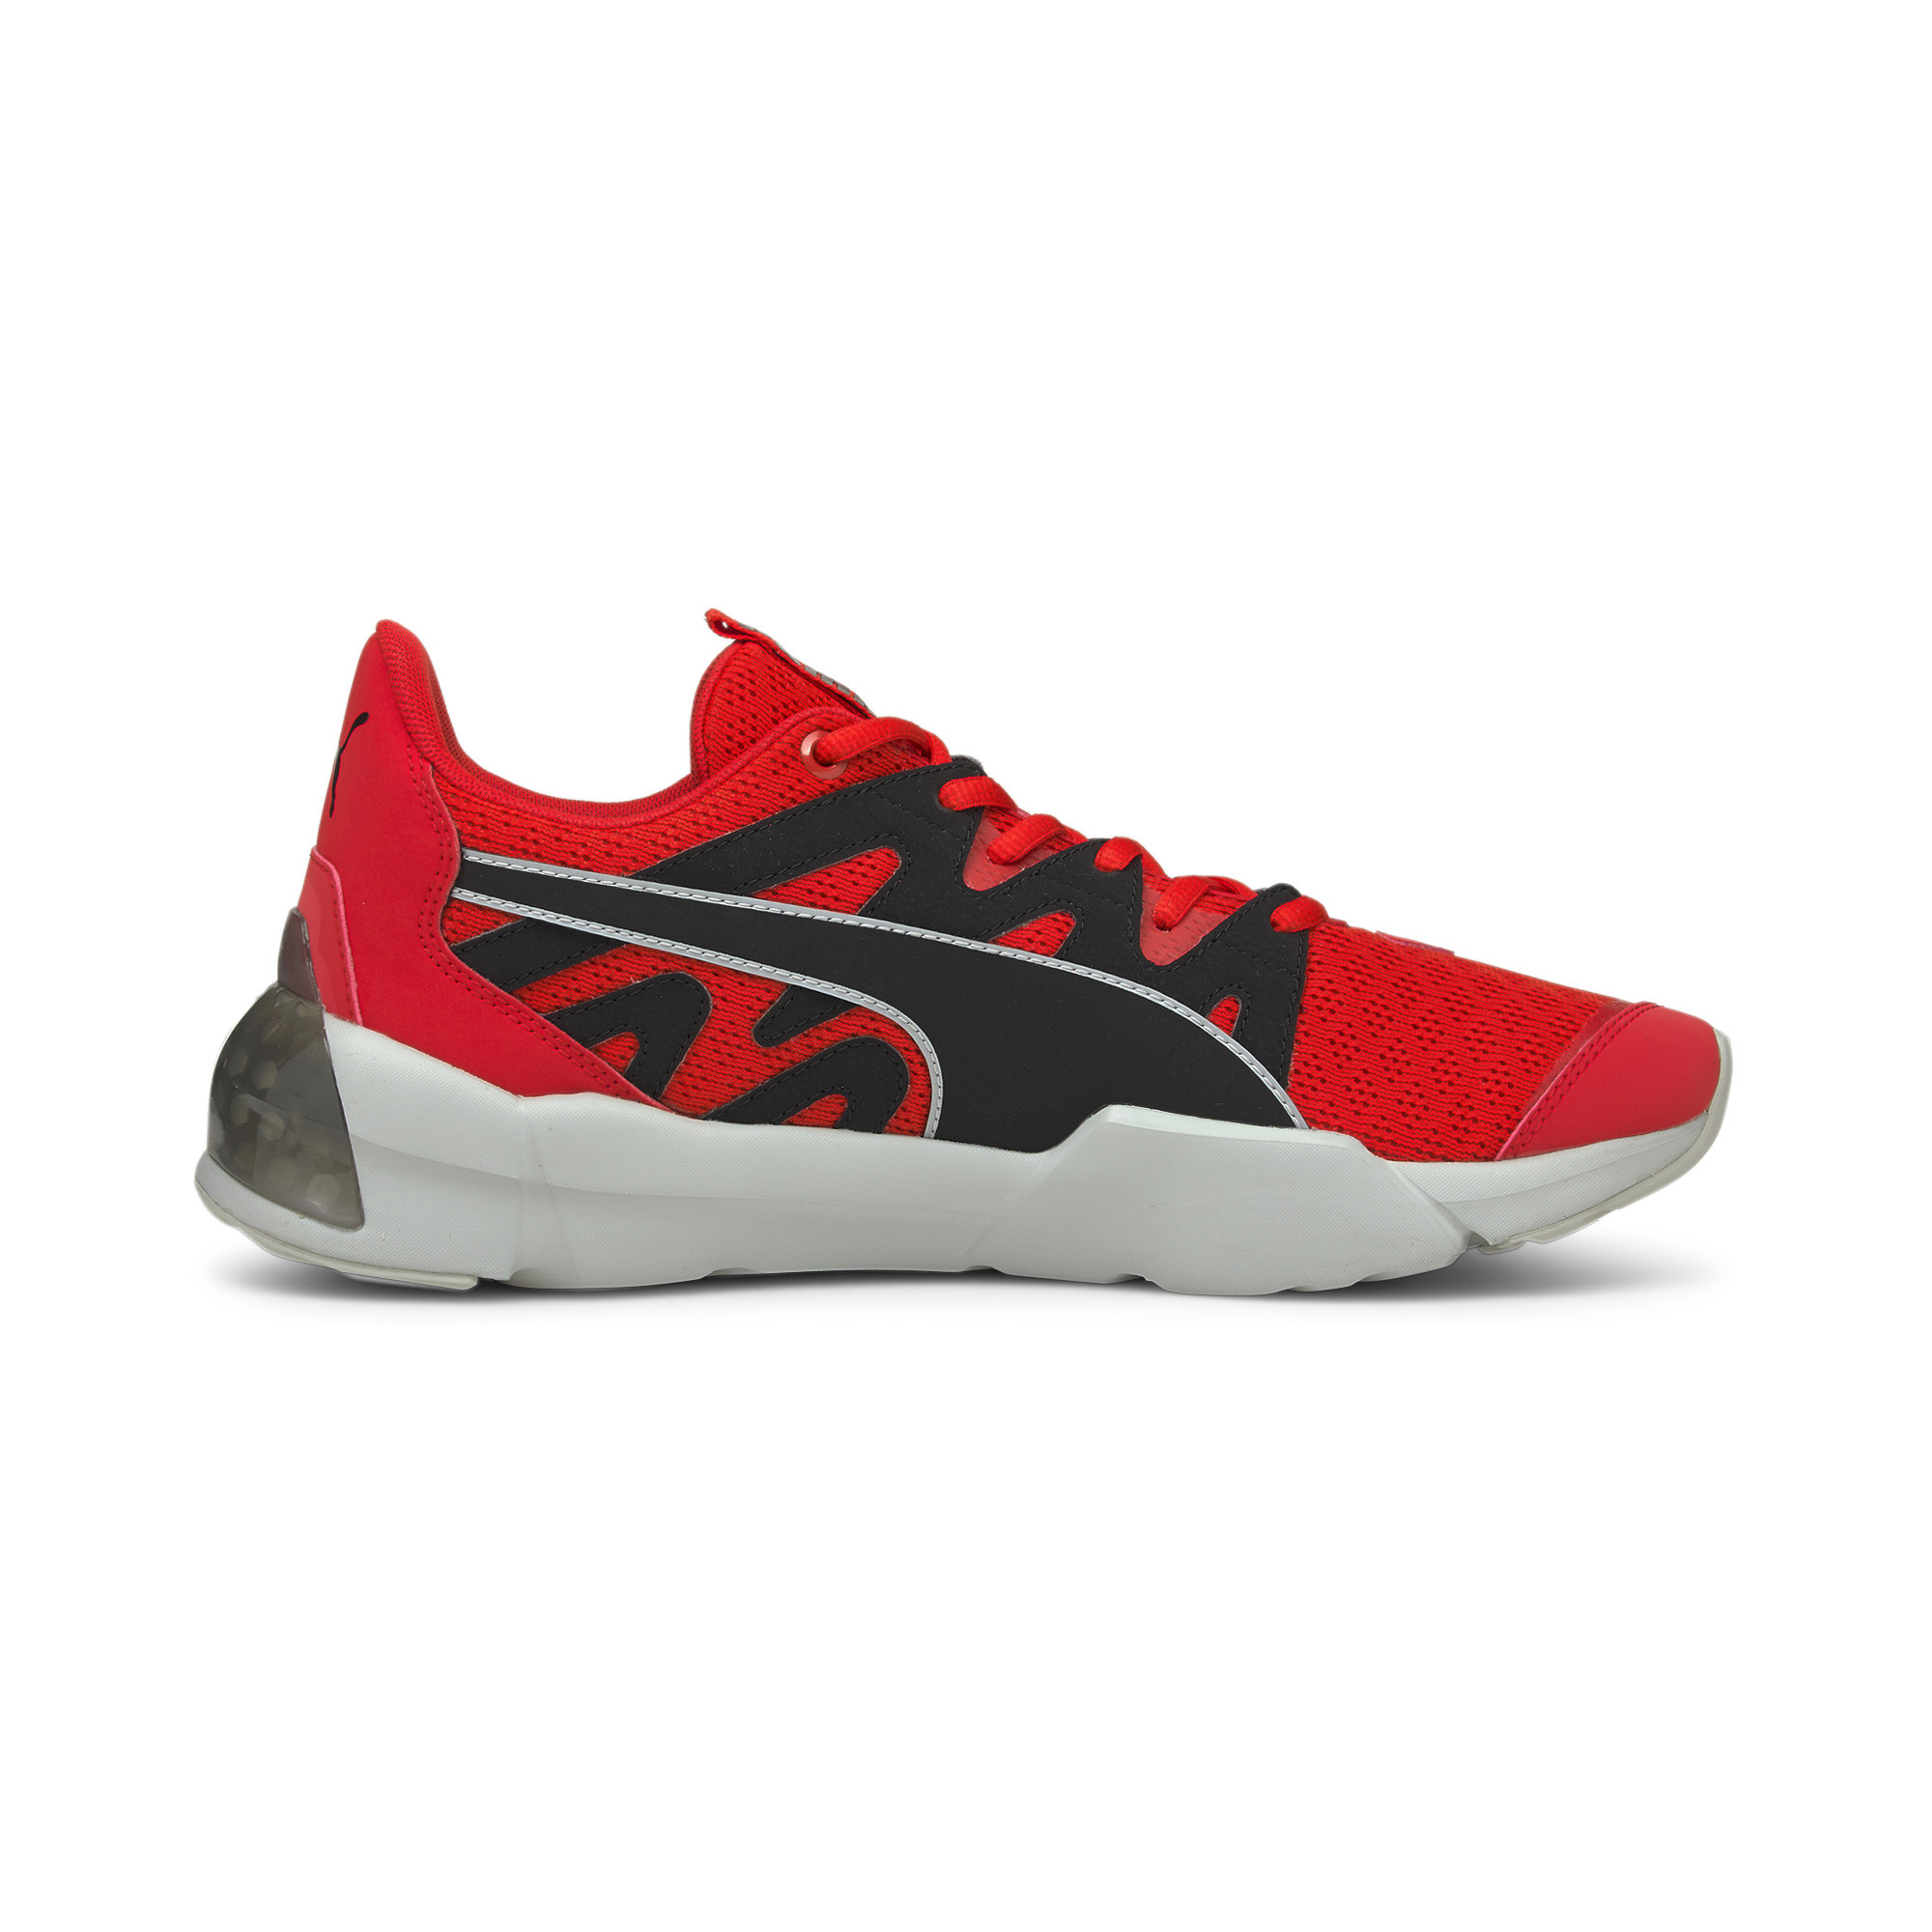 thumbnail 45 - PUMA Men's CELL Pharos Training Shoes